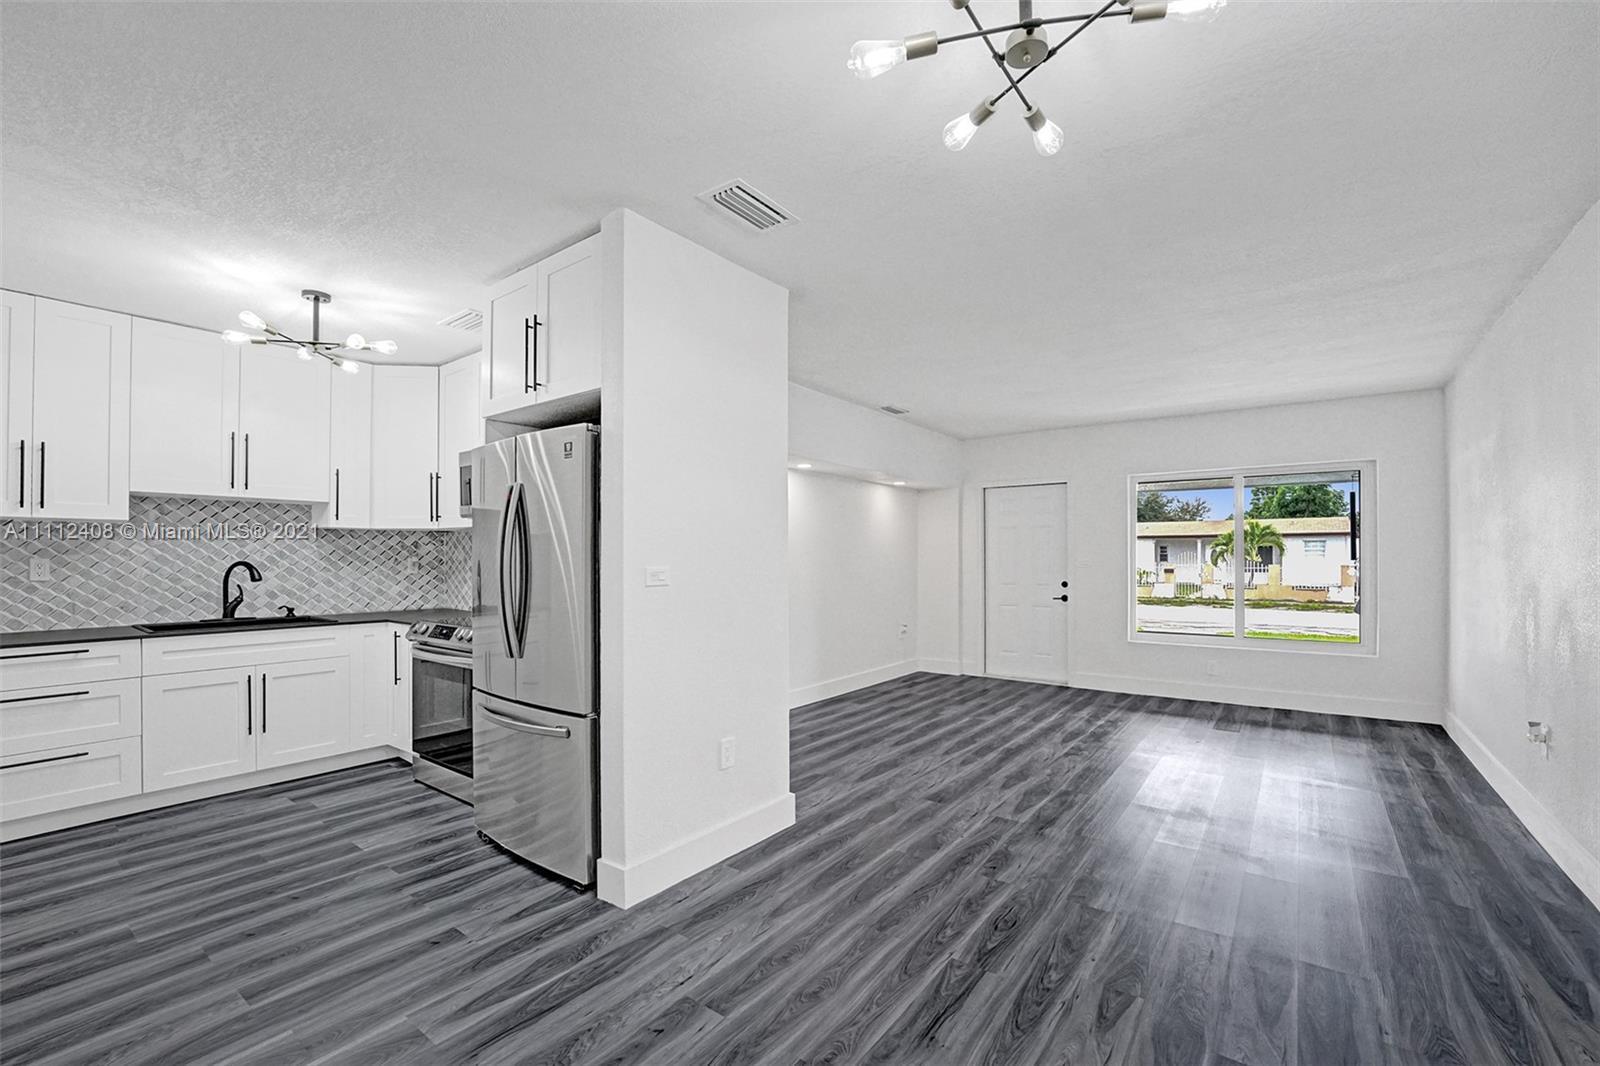 Single Family Home,For Rent,3071 NW 186th Ter #A, Miami Gardens, Florida 33056,Brickell,realty,broker,condos near me